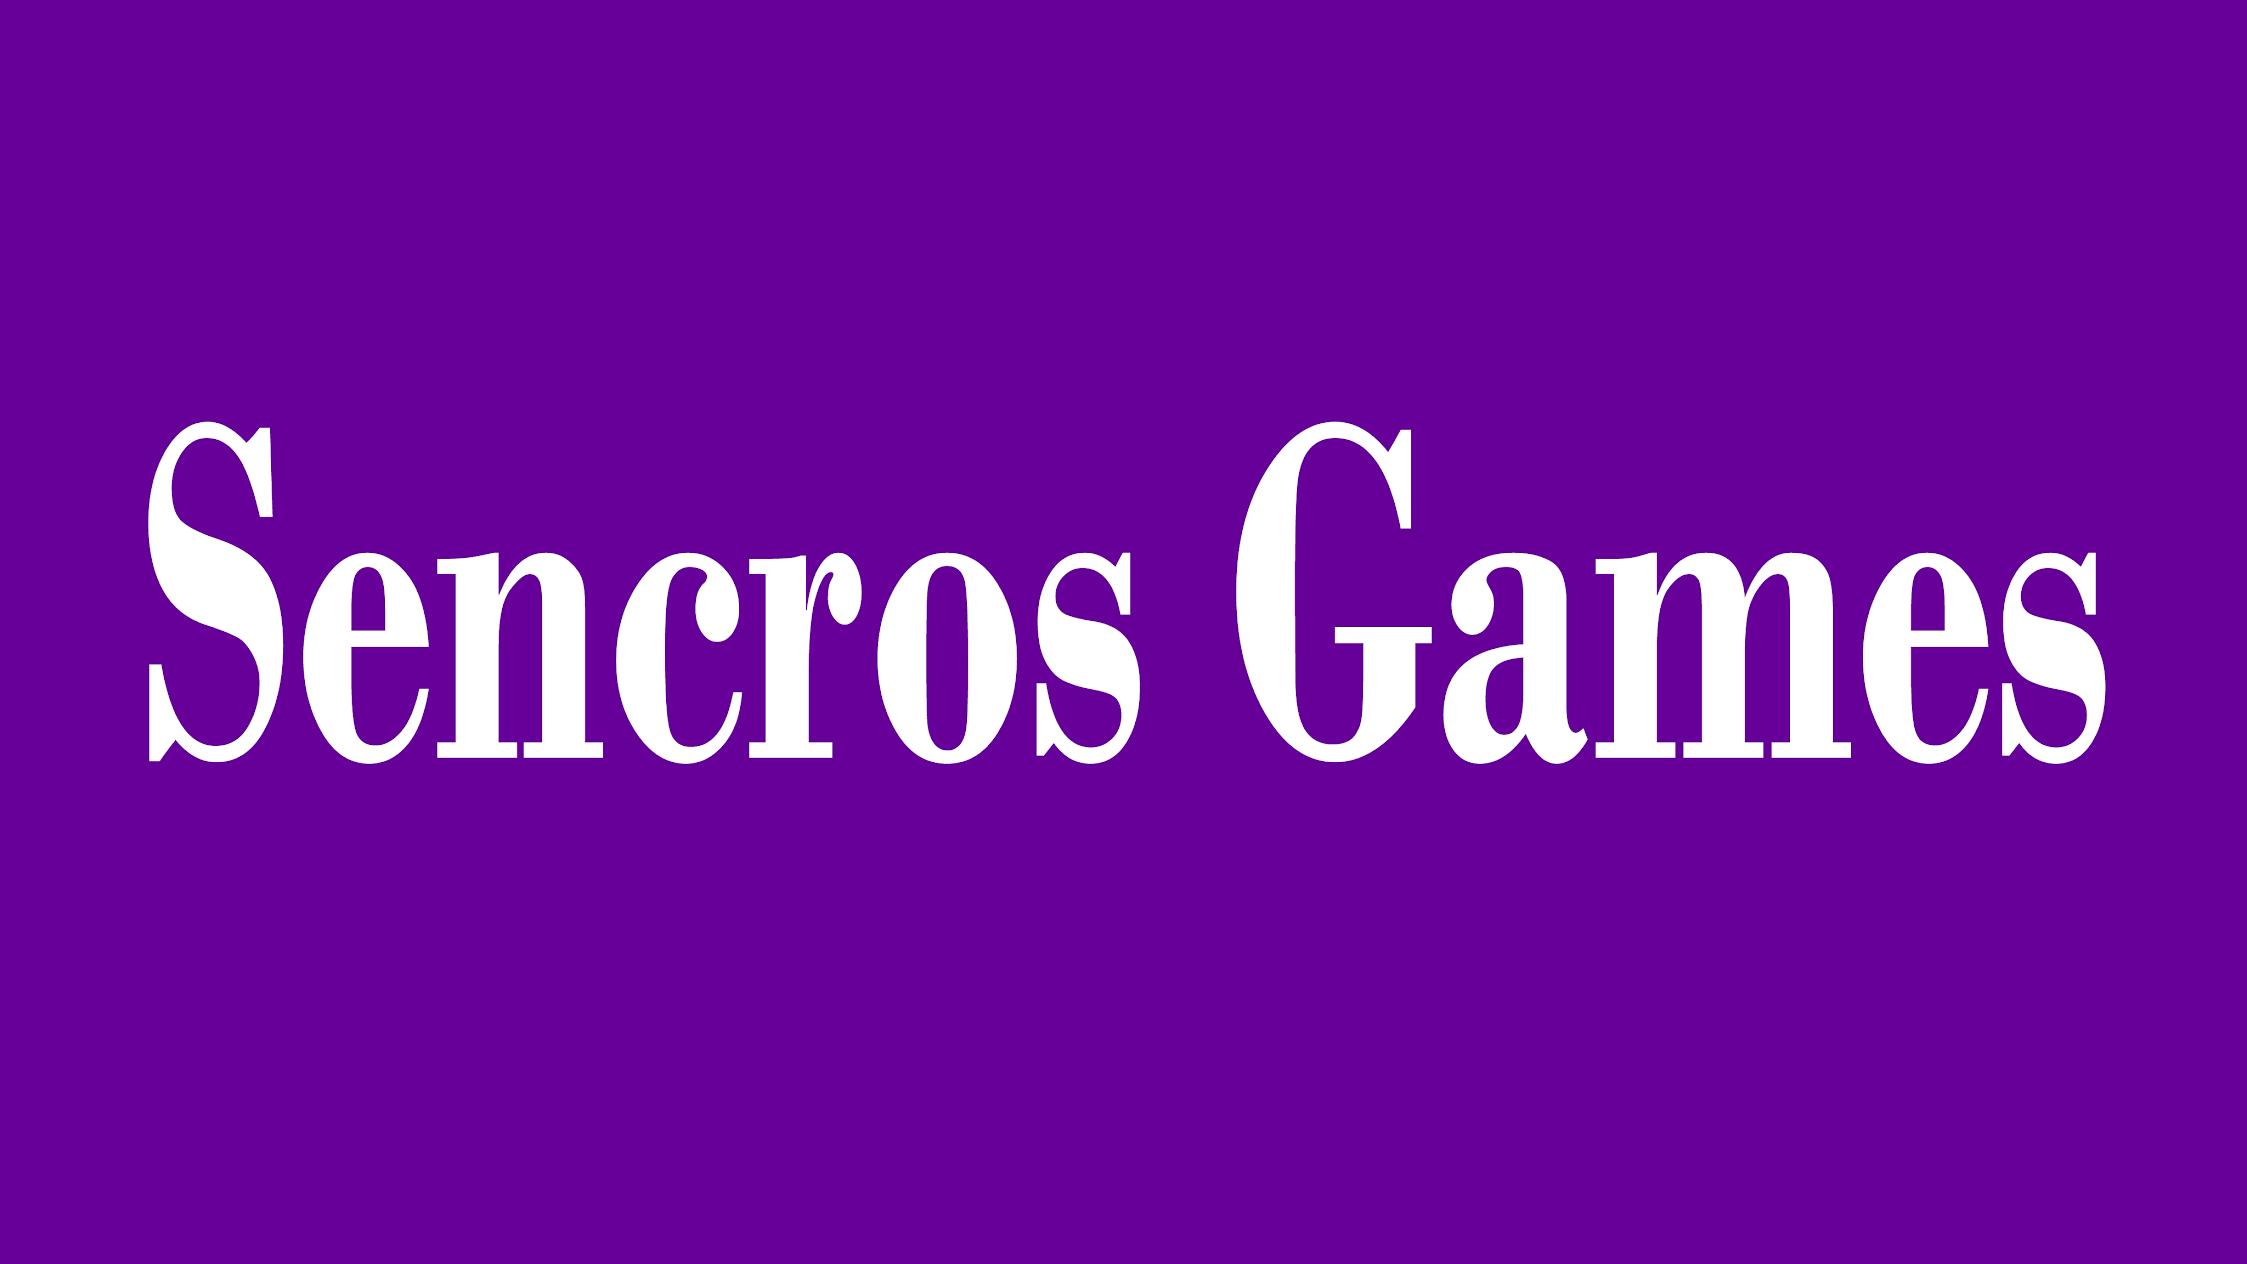 Sencros Games